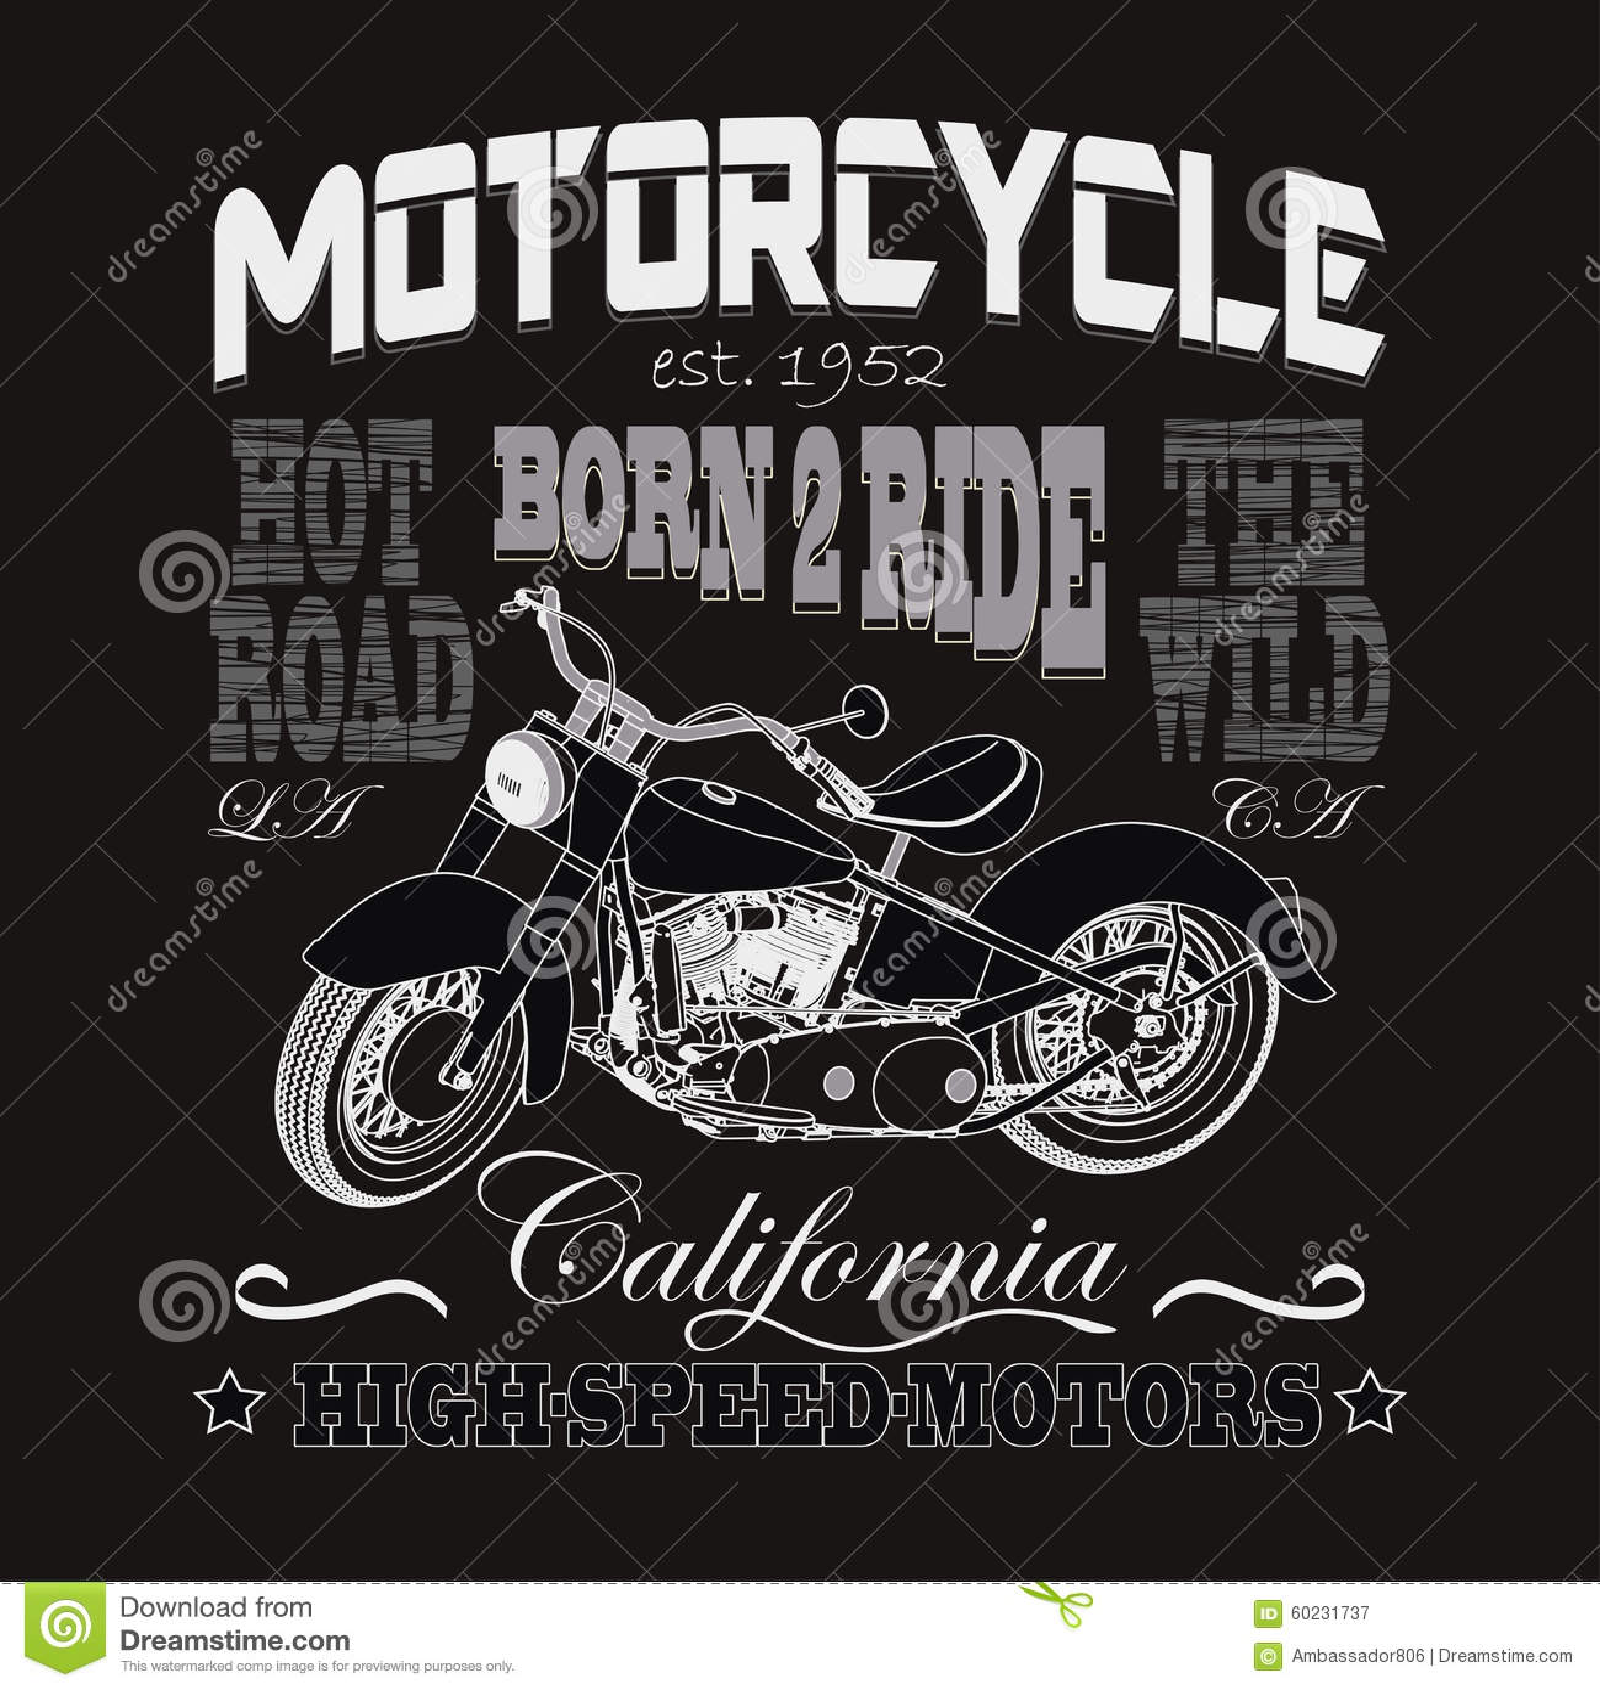 Typographie de emballage de moto, moteurs de la Californie